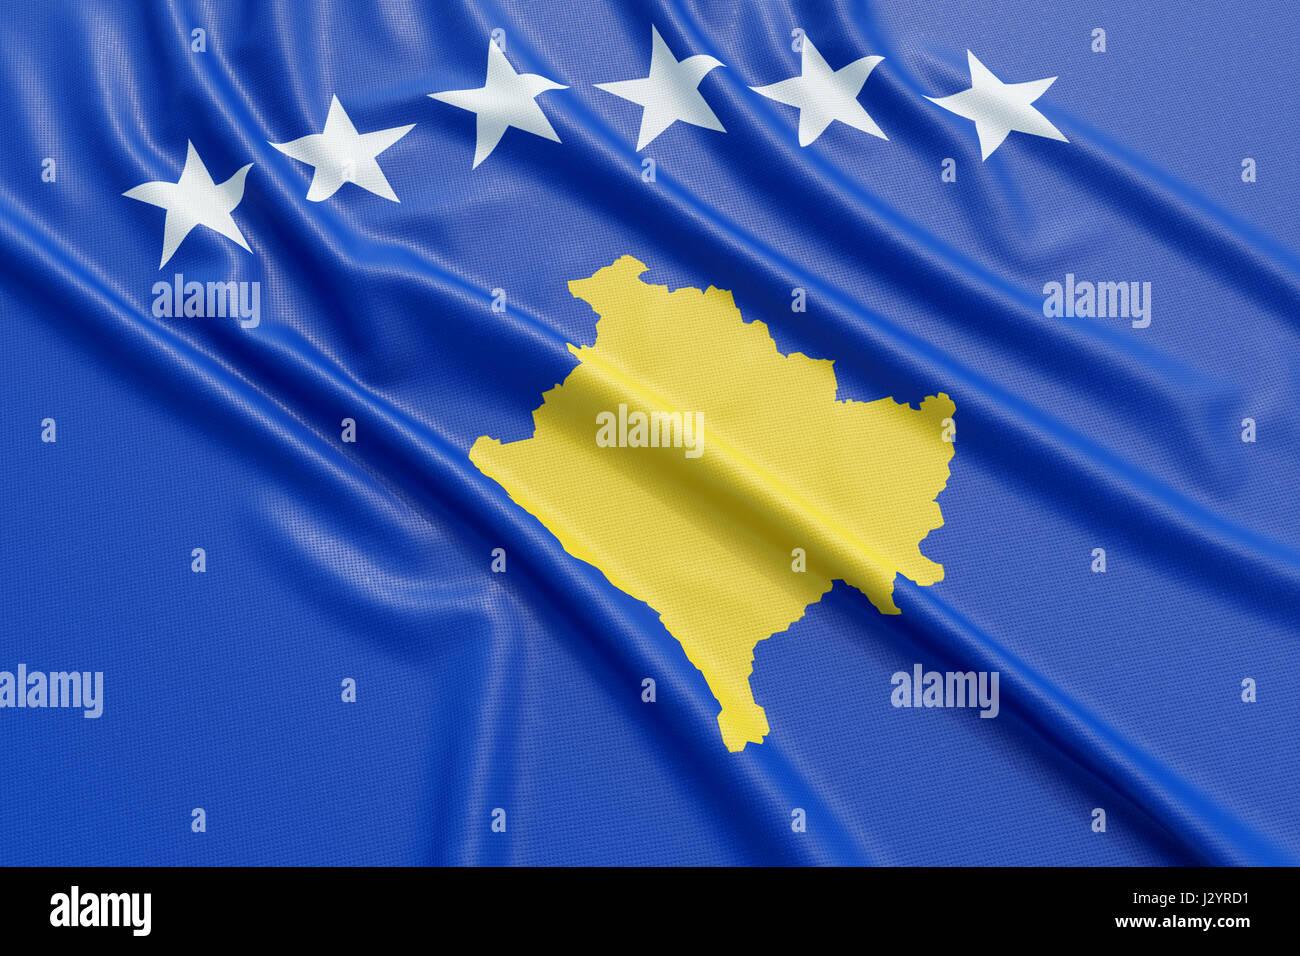 Kosovo flag. Wavy fabric high detailed texture. 3d illustration rendering Stock Photo